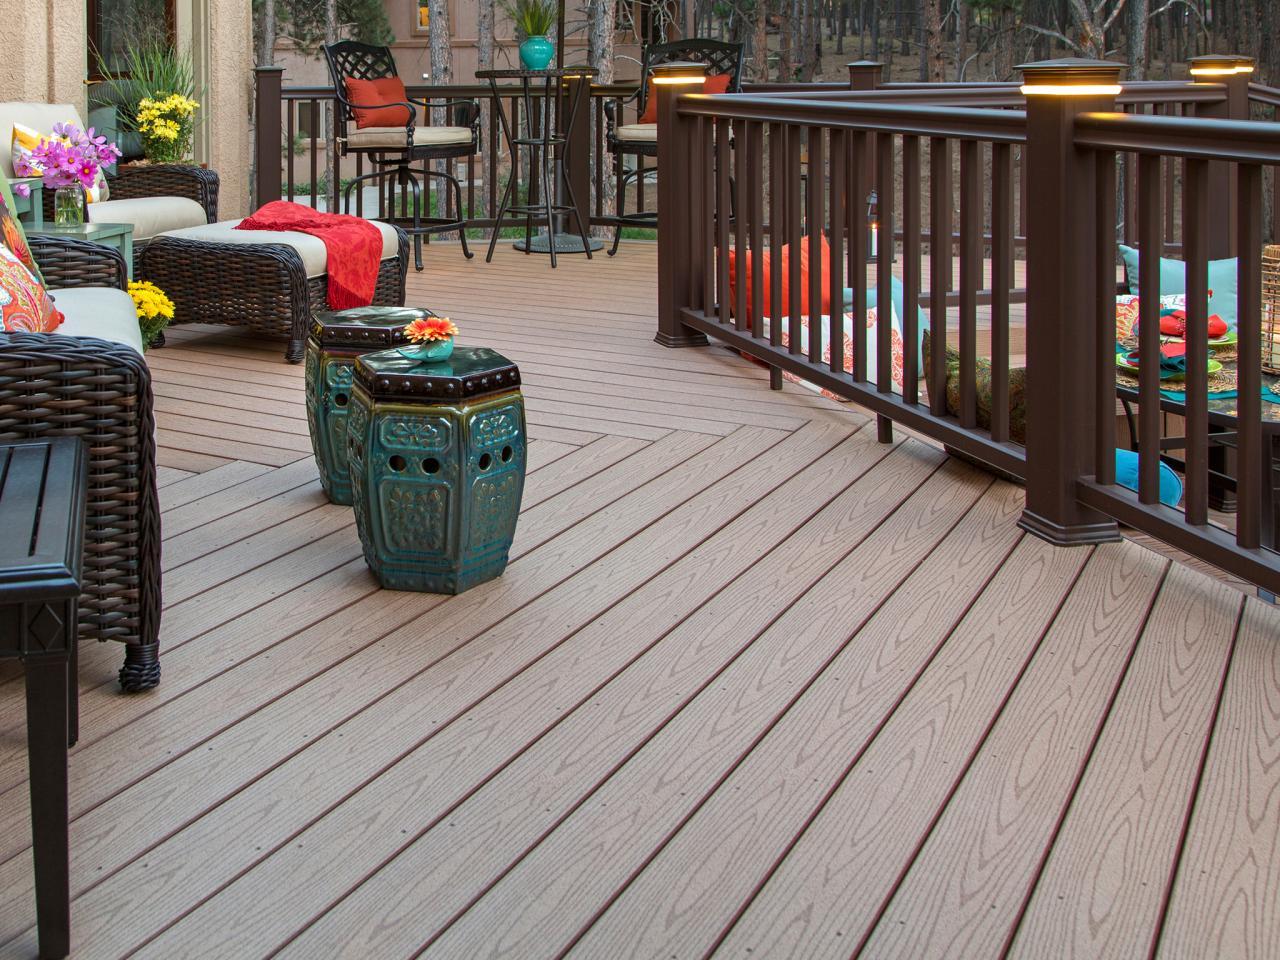 Trex Deck Design Ideas deck lighting Decking Materials Composite Decking